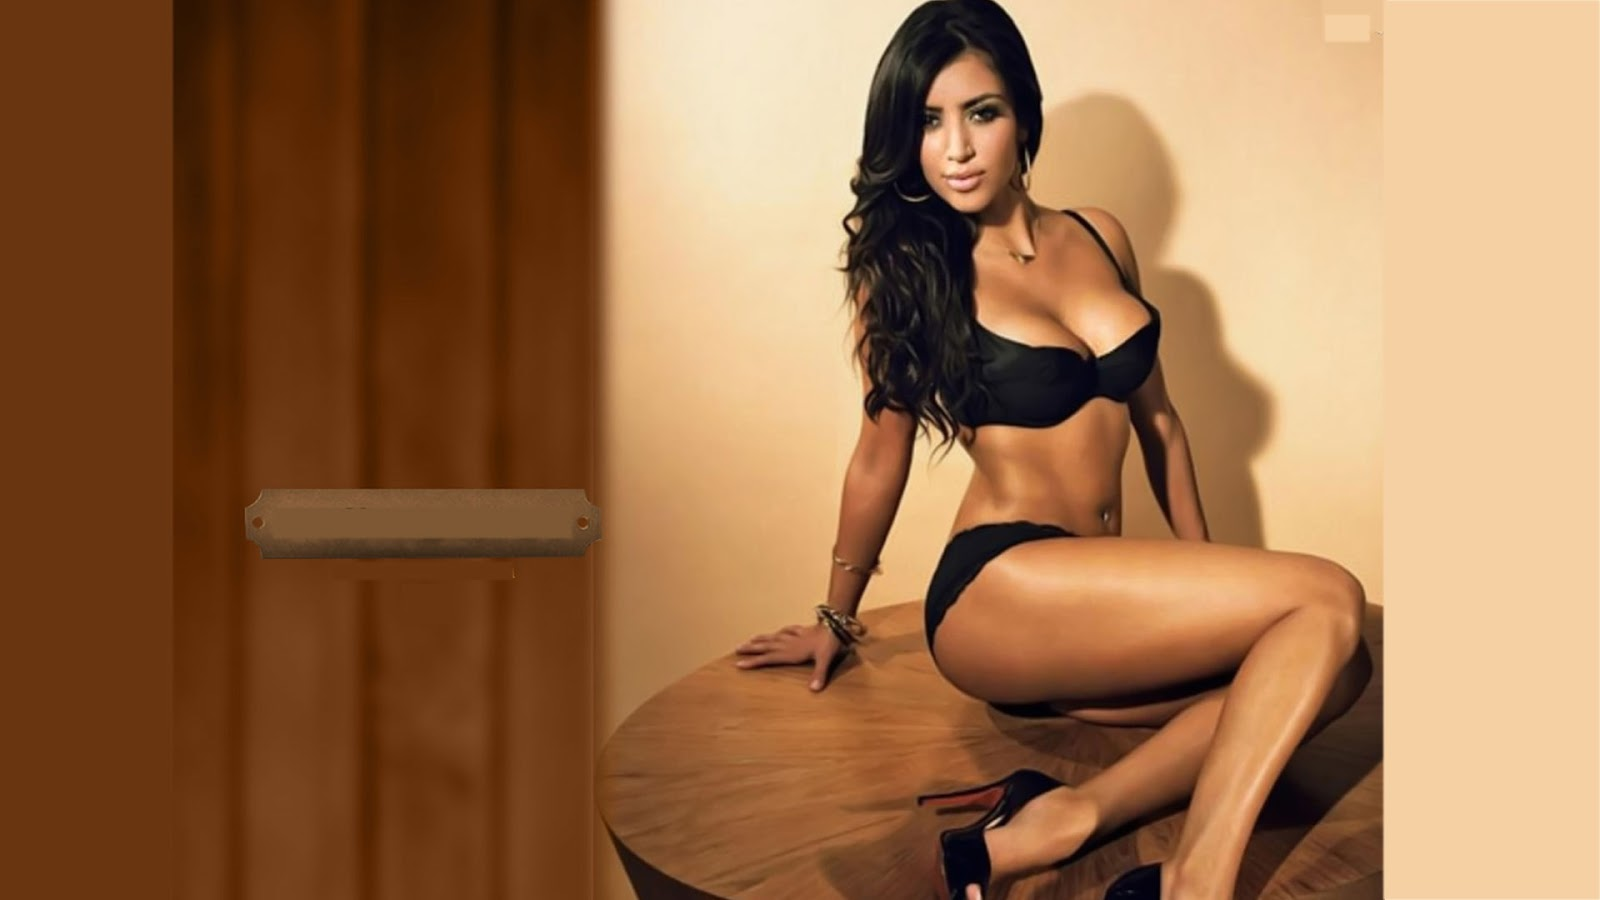 World Top Most Beautiful Female Celebrities - Dremnews -8130